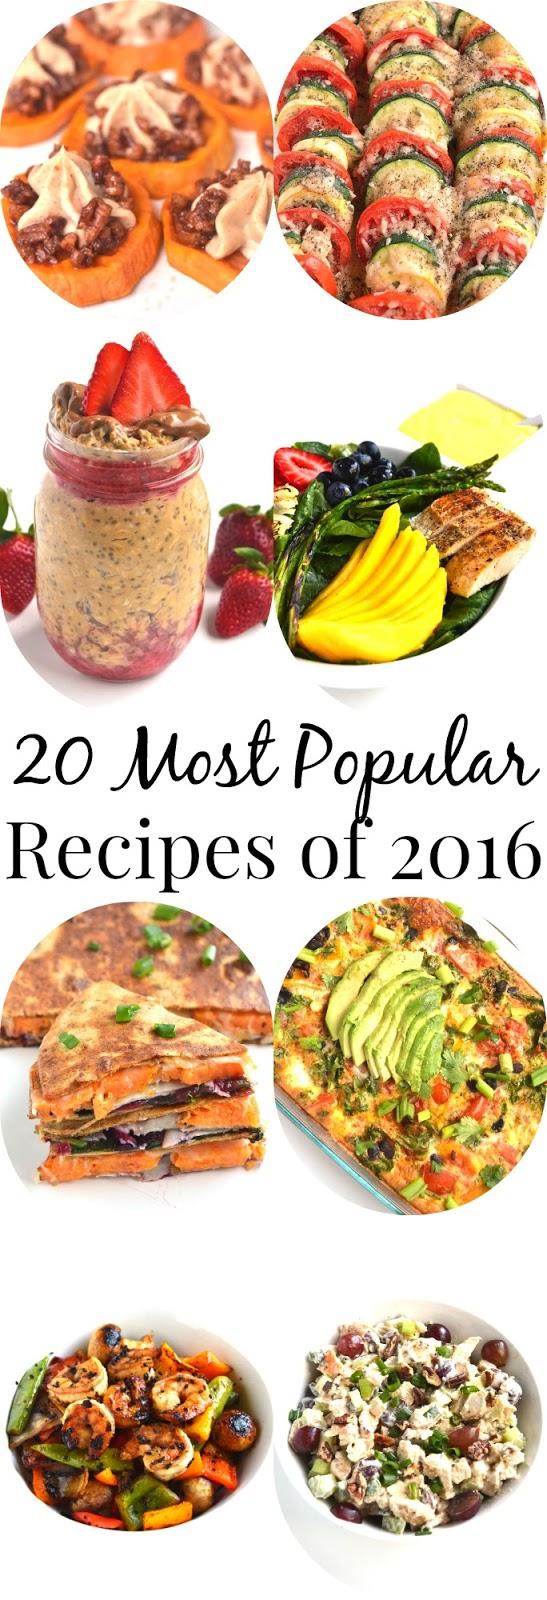 20 Most Popular Recipes of 2016 www.nutritionistreviews.com